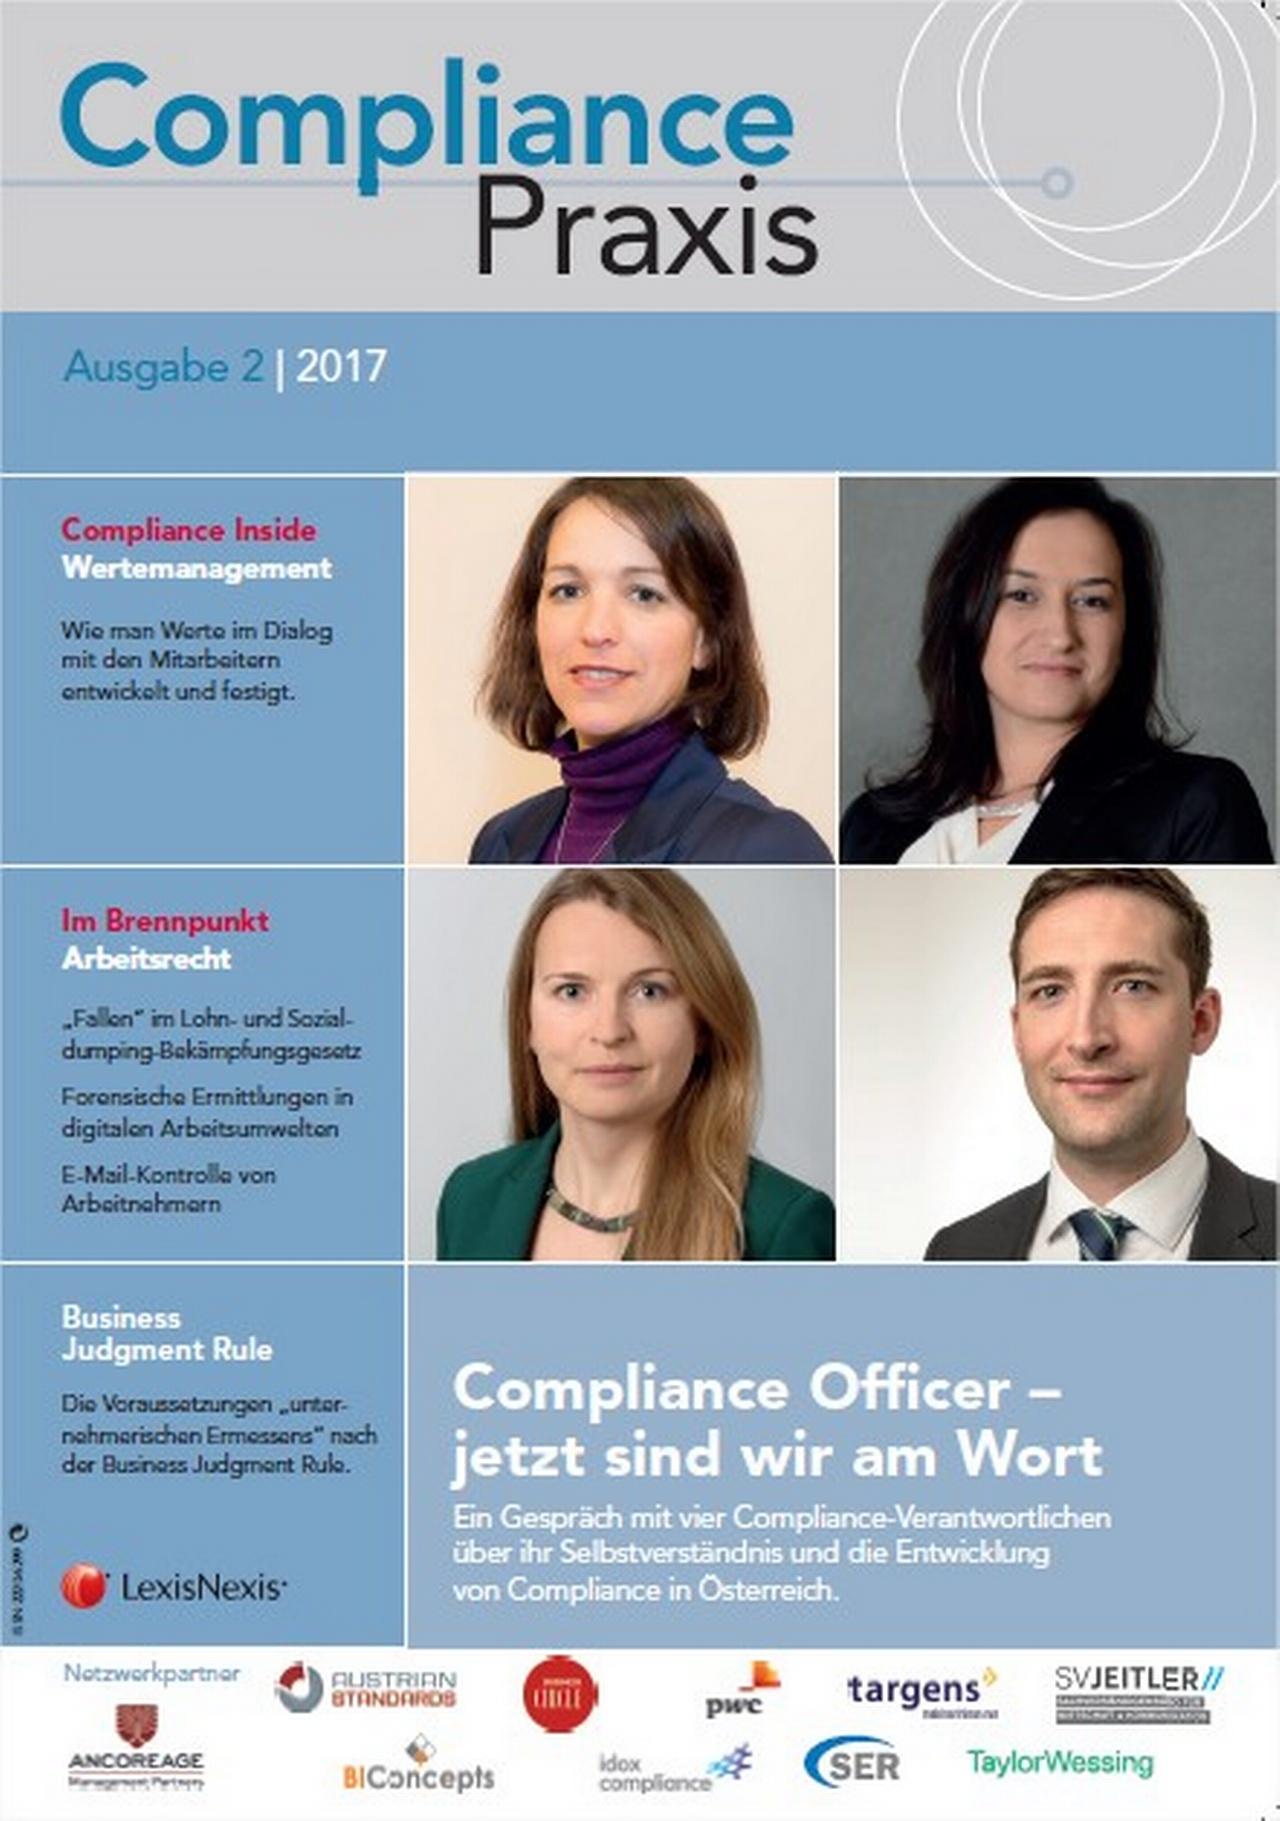 Cover von Compliance Praxis Ausgabe 2/2017, © LexisNexis